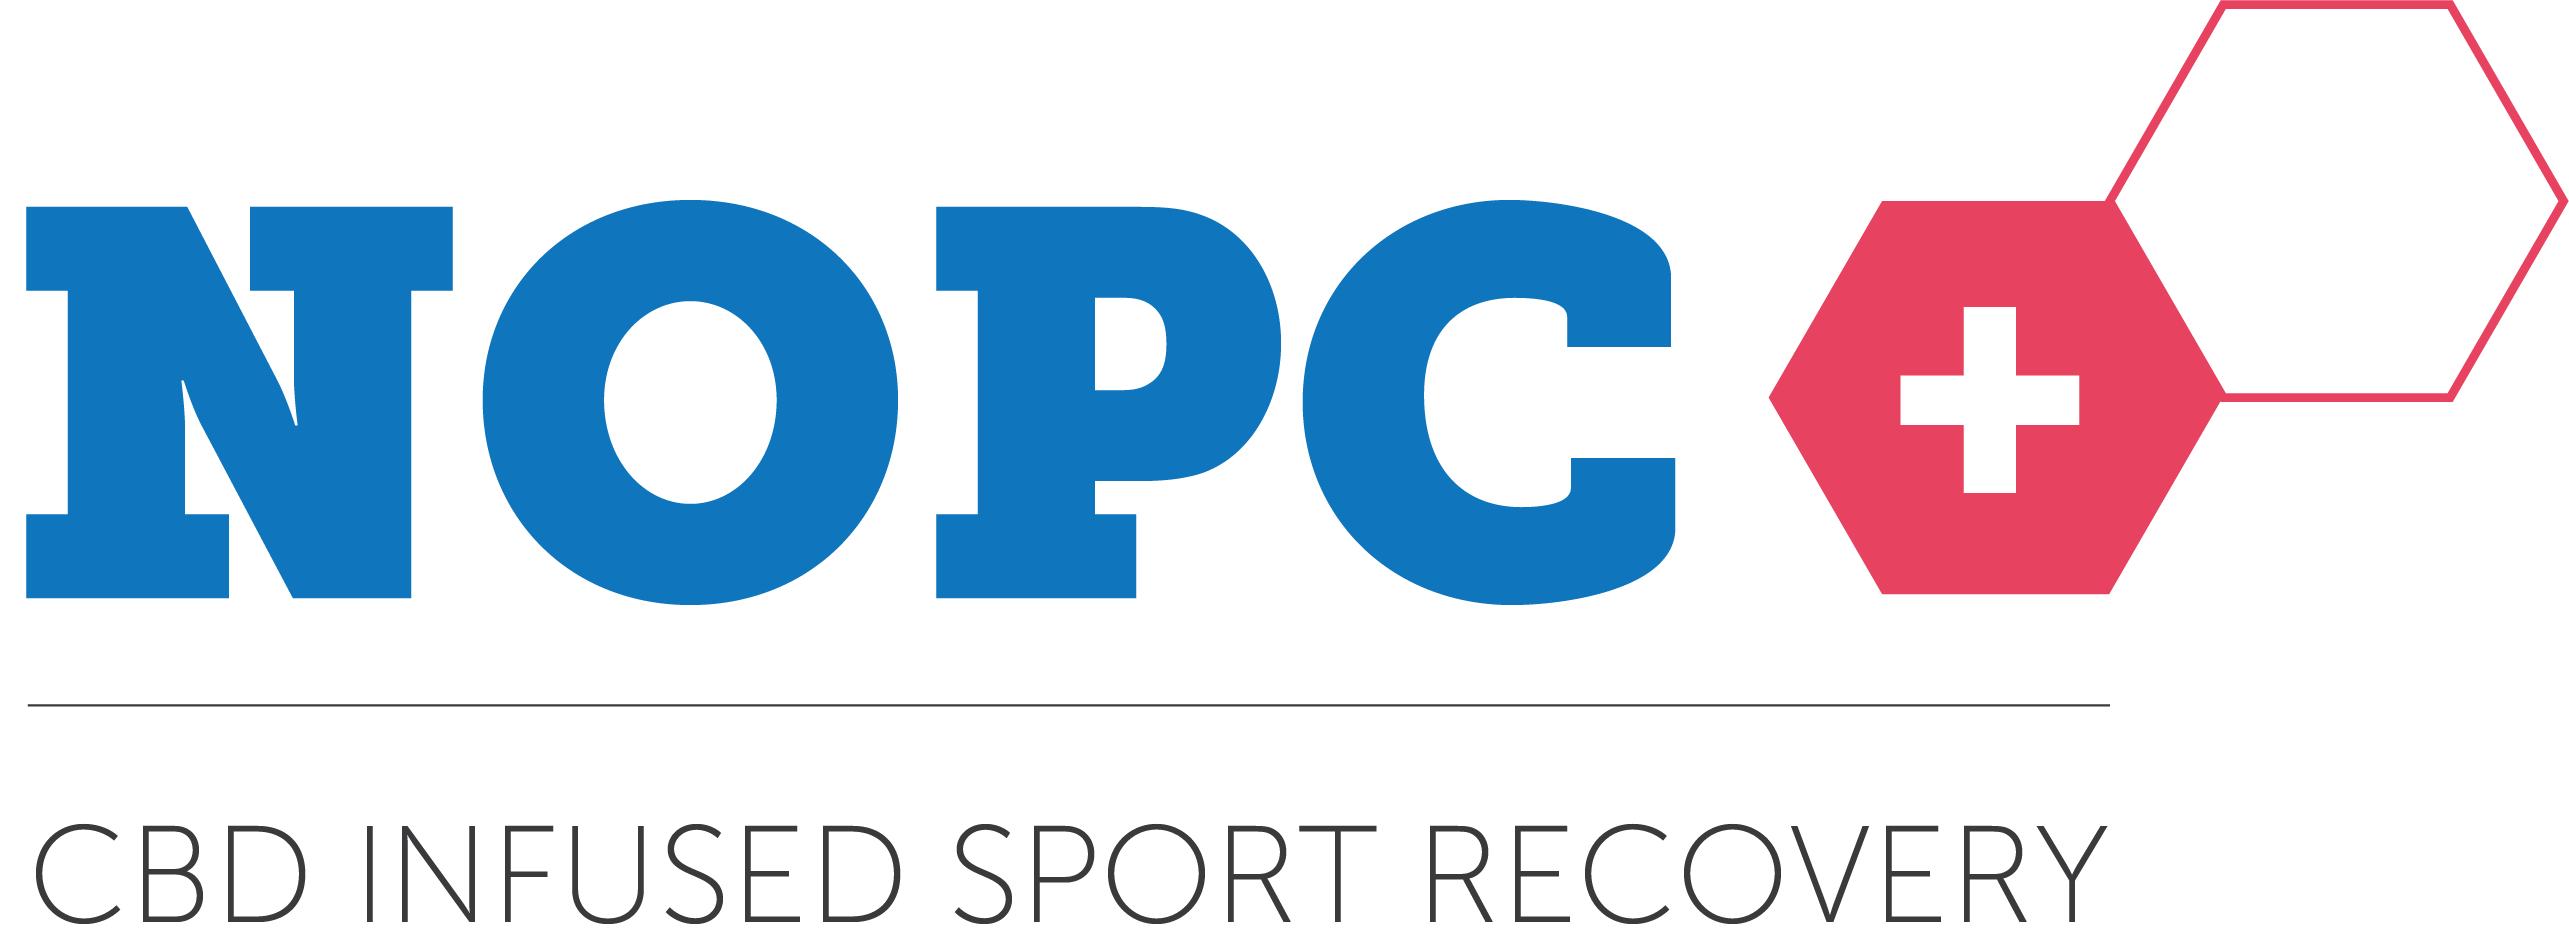 CBD iinfused sport recovery   CBD oils   CBD uk